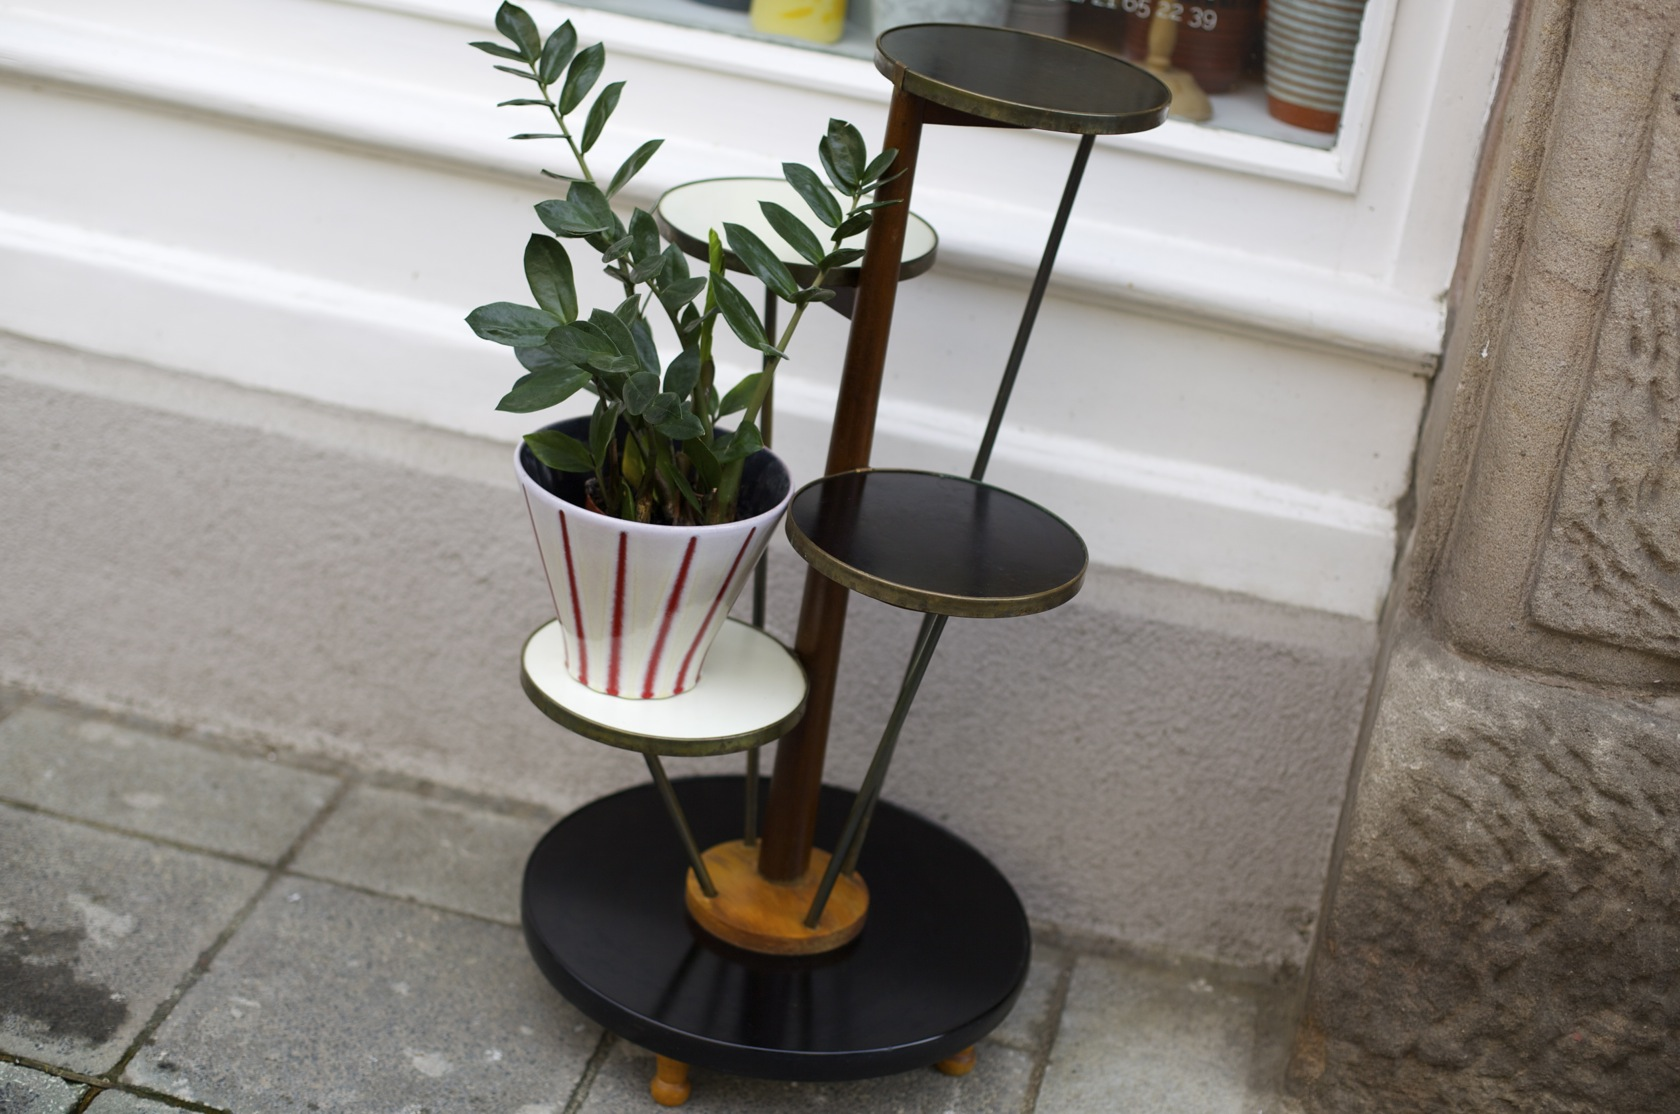 blumenetagere 50er jahre raumwunder vintage wohnen in n rnberg. Black Bedroom Furniture Sets. Home Design Ideas